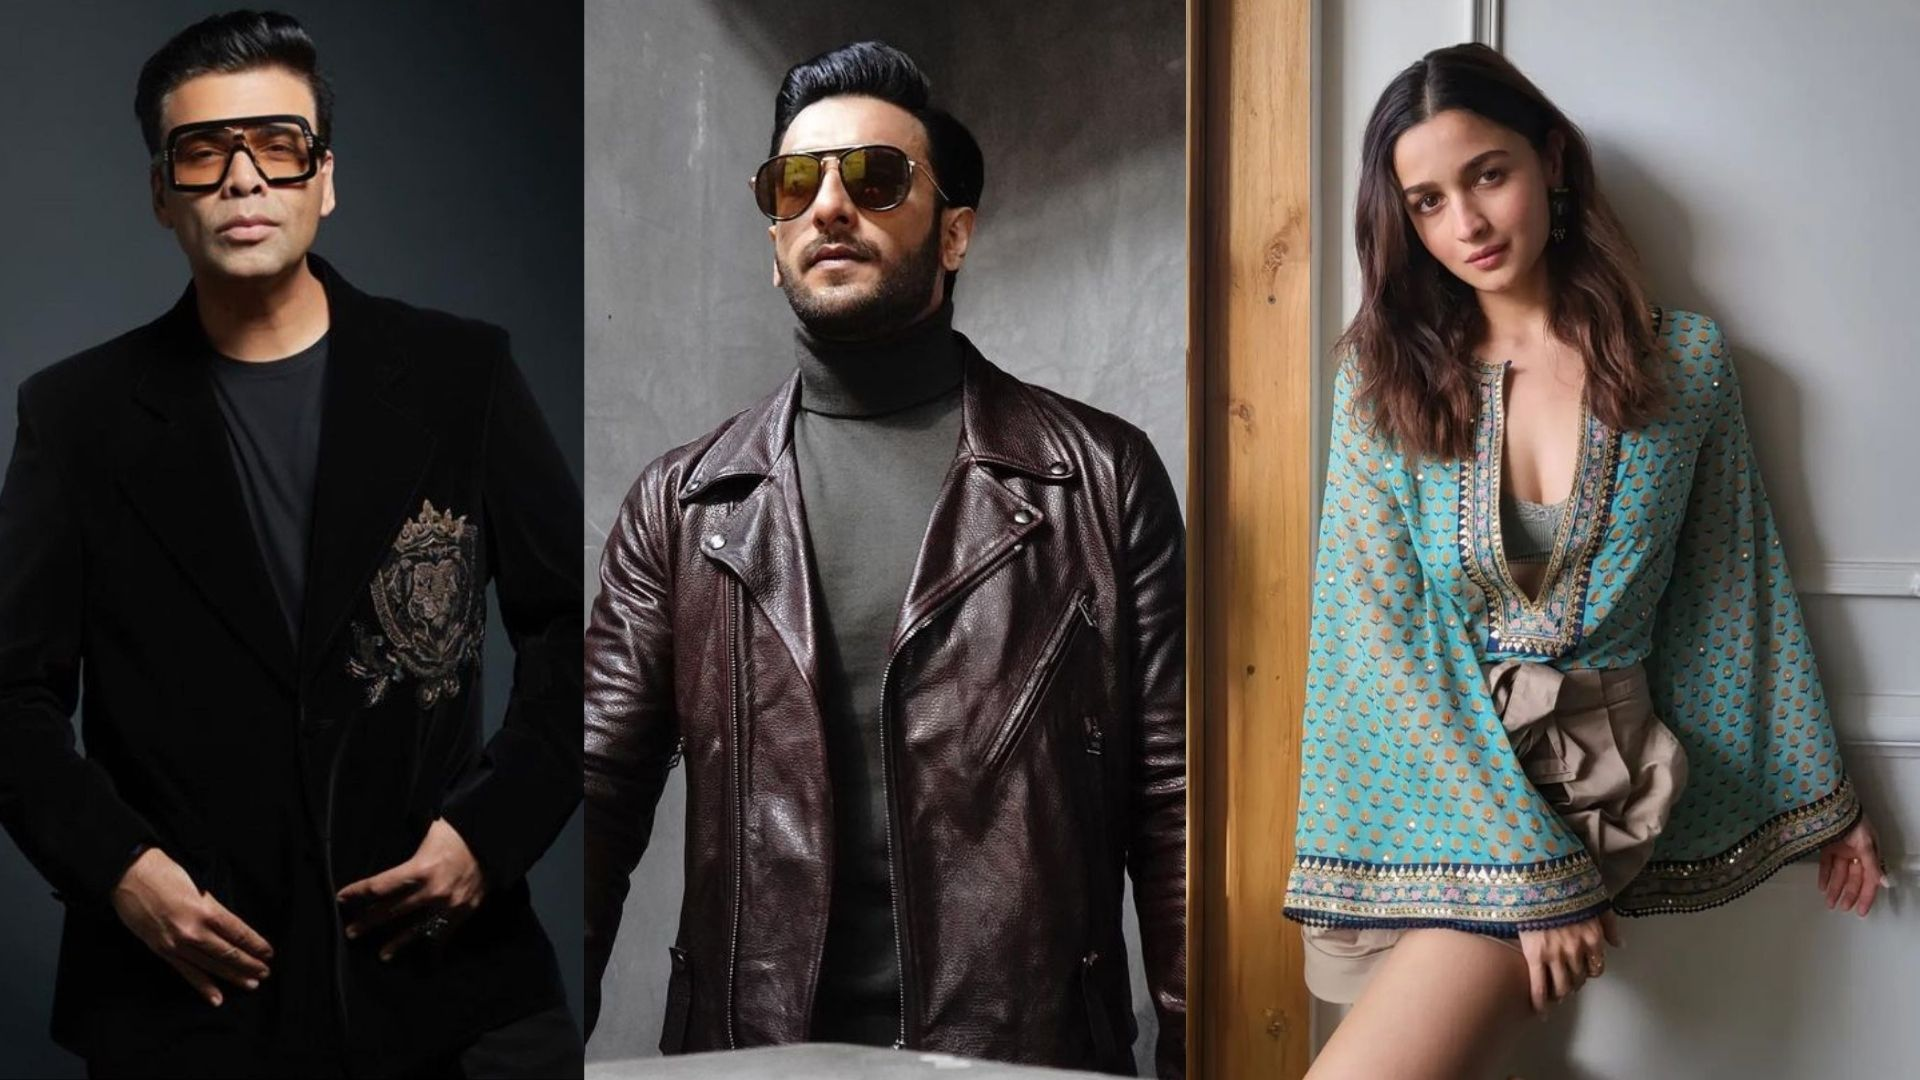 Karan Johar Finally Reacts On Takht Being Shelved; Opens Up About Ranveer Singh And Alia Bhatt's Rocky Aur Rani Ki Prem Kahani